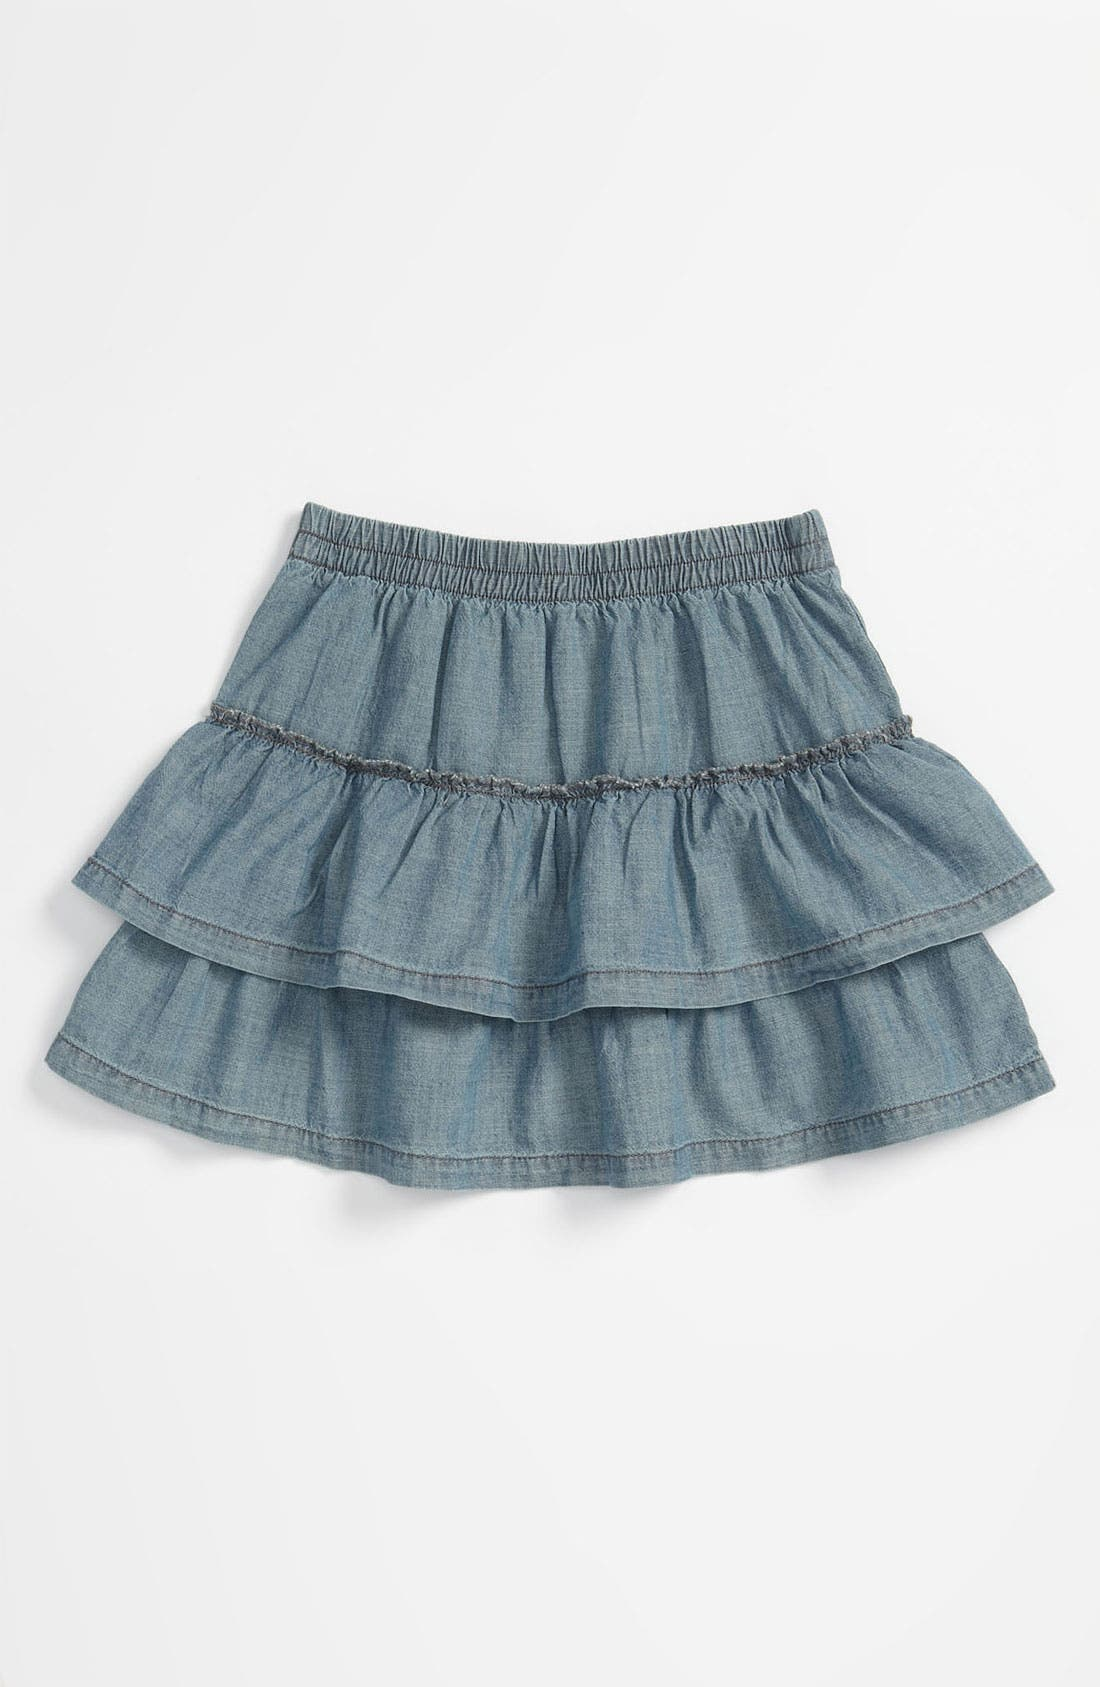 Alternate Image 1 Selected - Peek 'Darcy' Skirt (Toddler, Little Girls & Big Girls)